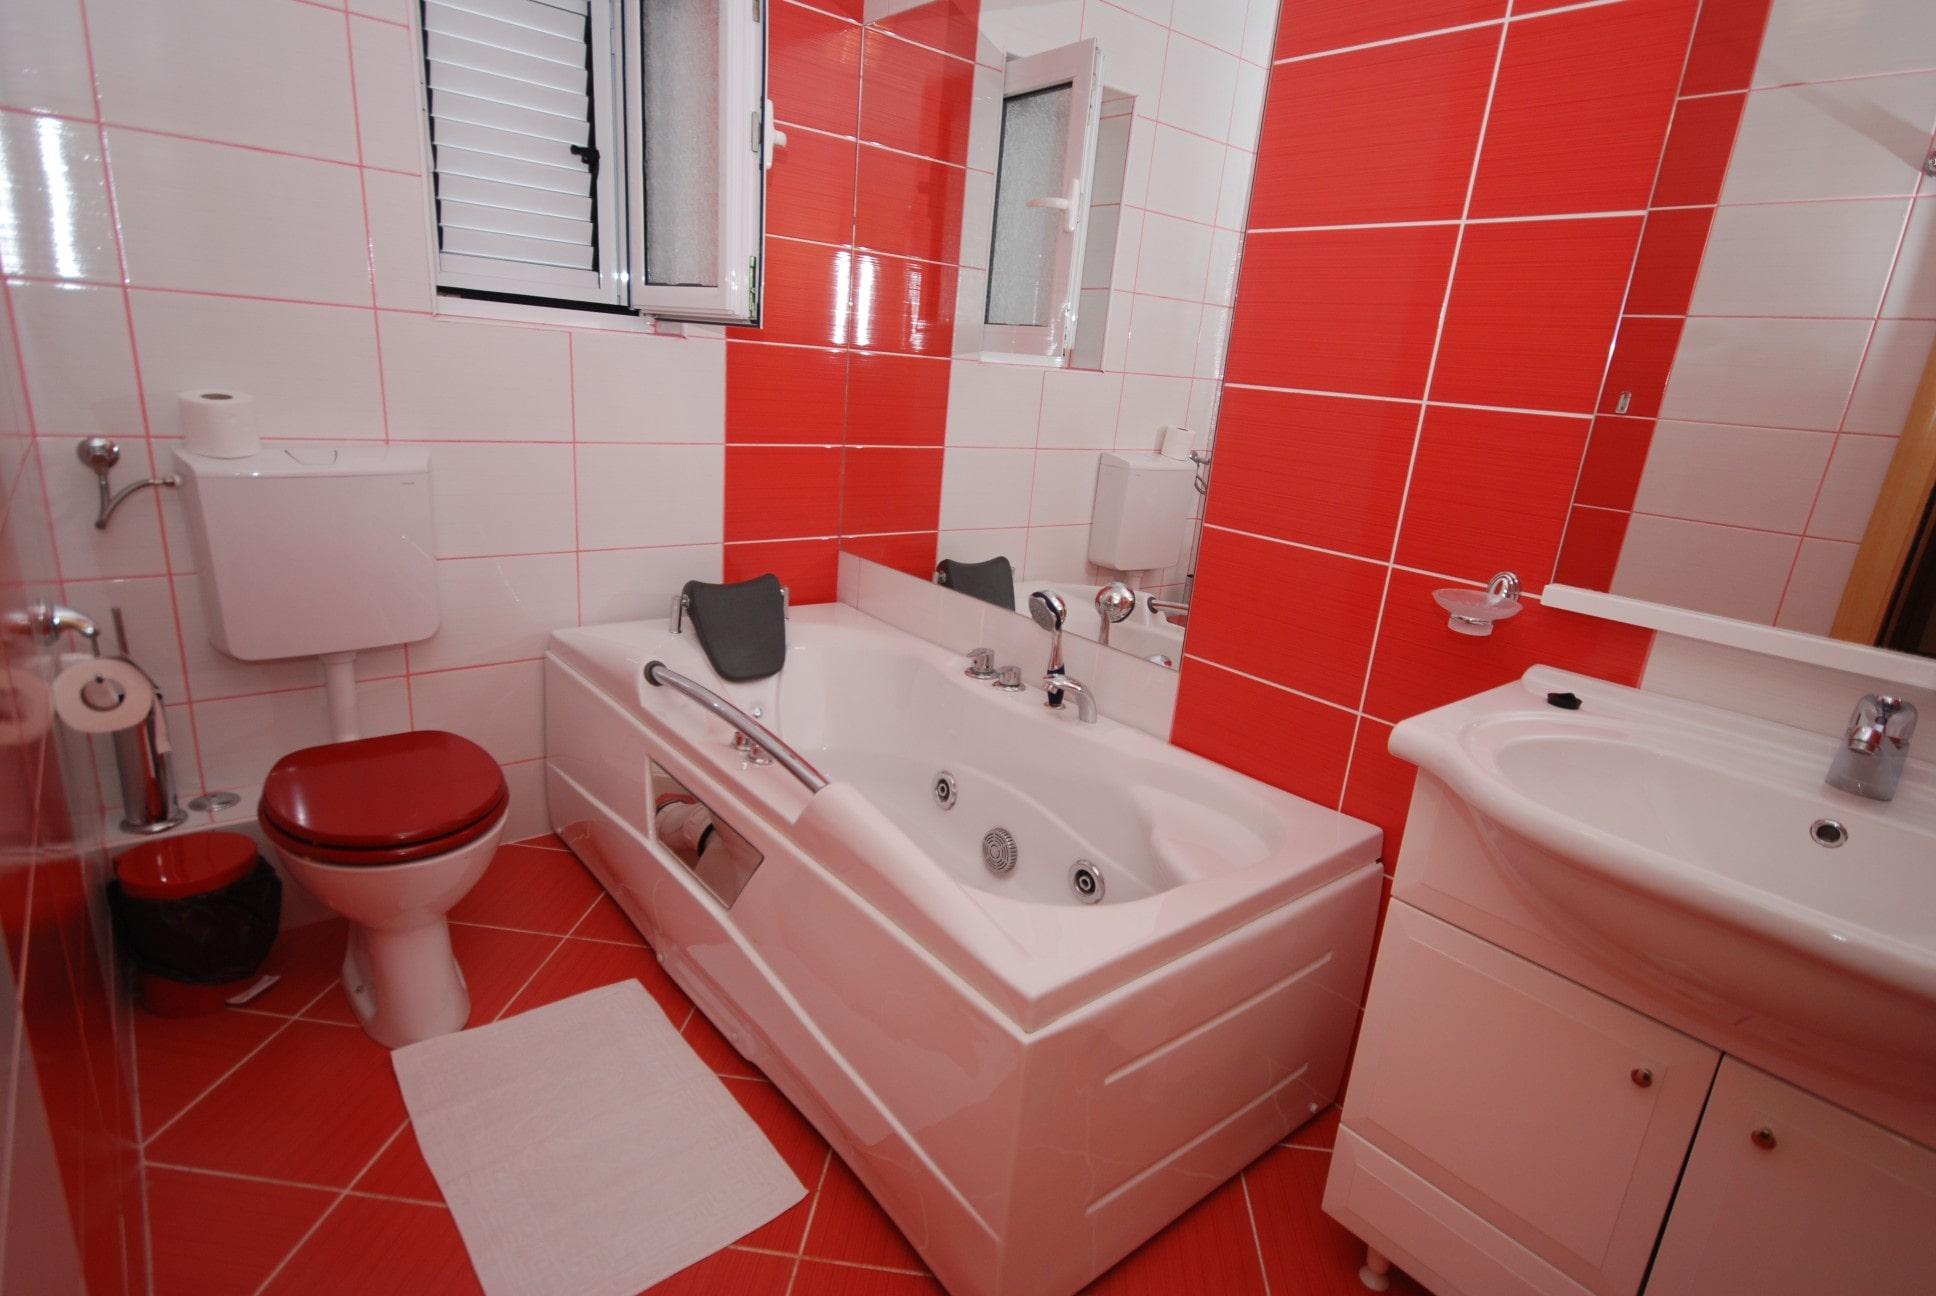 Red apartment bathrooom Springs apartments Montenegro